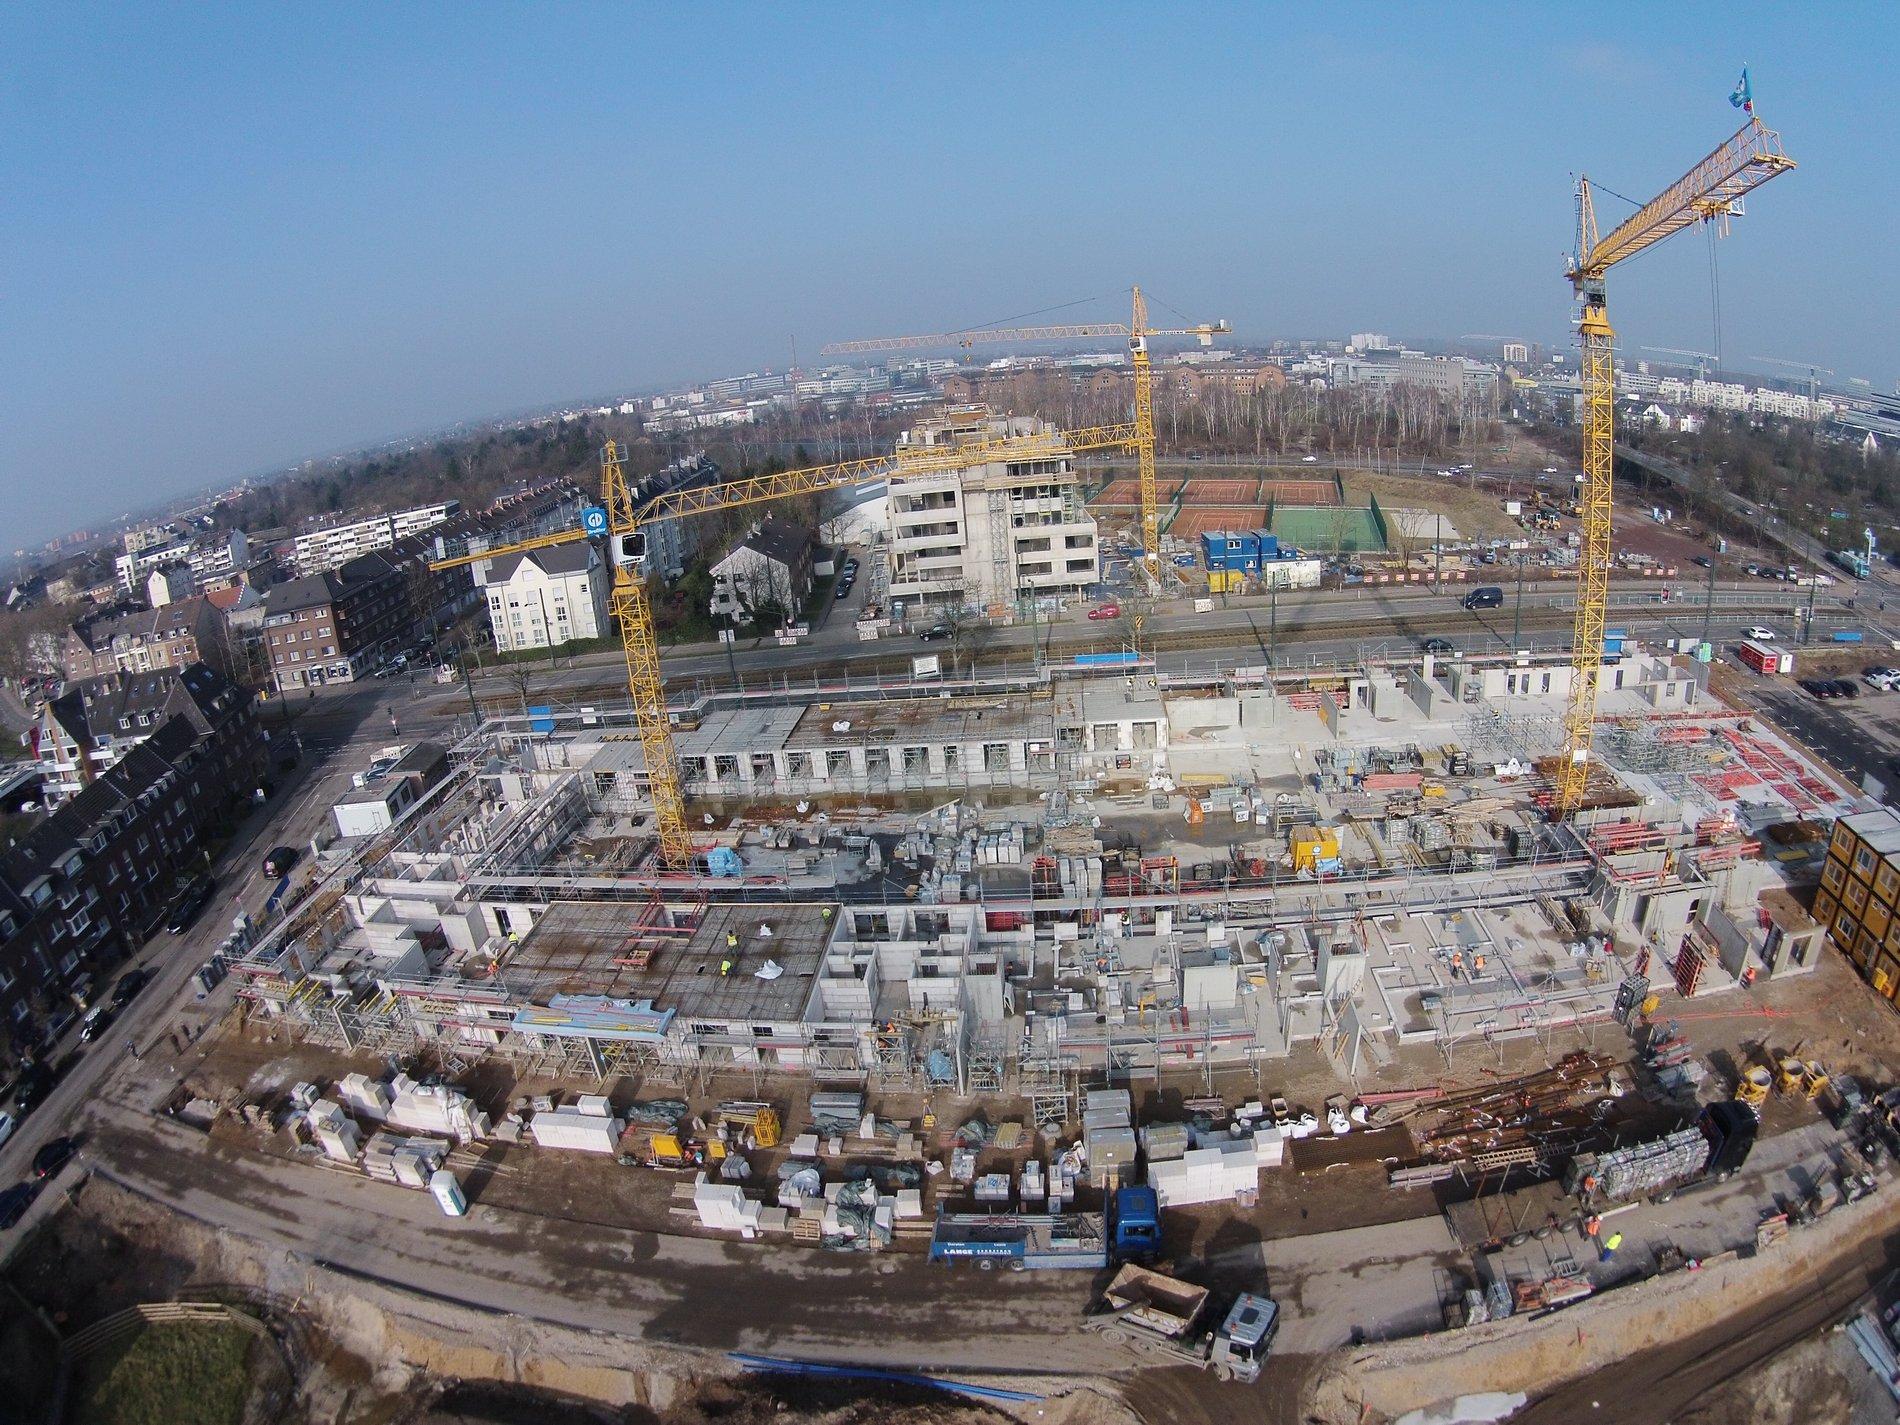 RKM740 Baustatus vom 11.03.2015